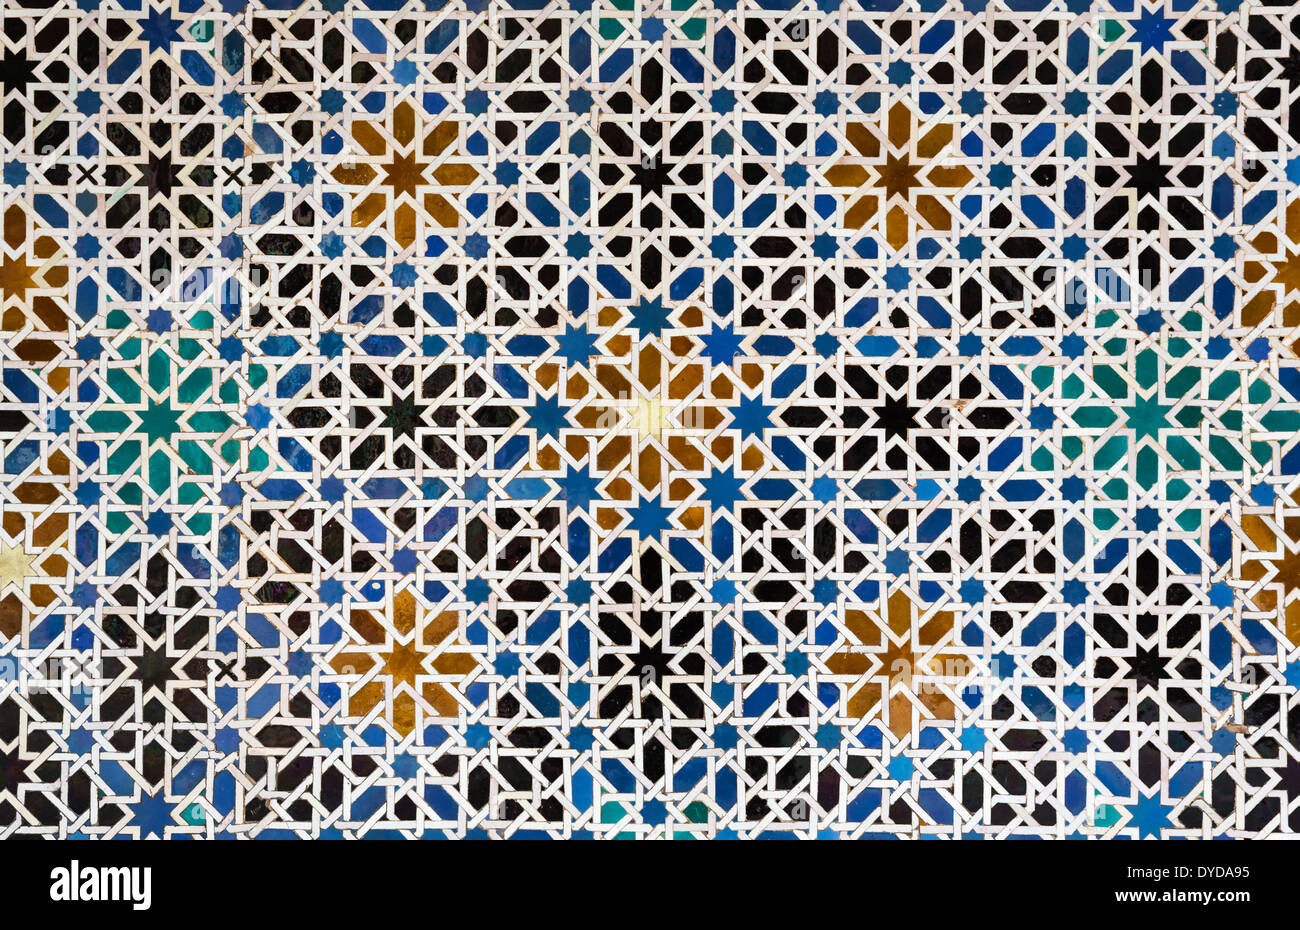 Moroccan geometric pattern royalty free stock photos image 13547078 - Stock